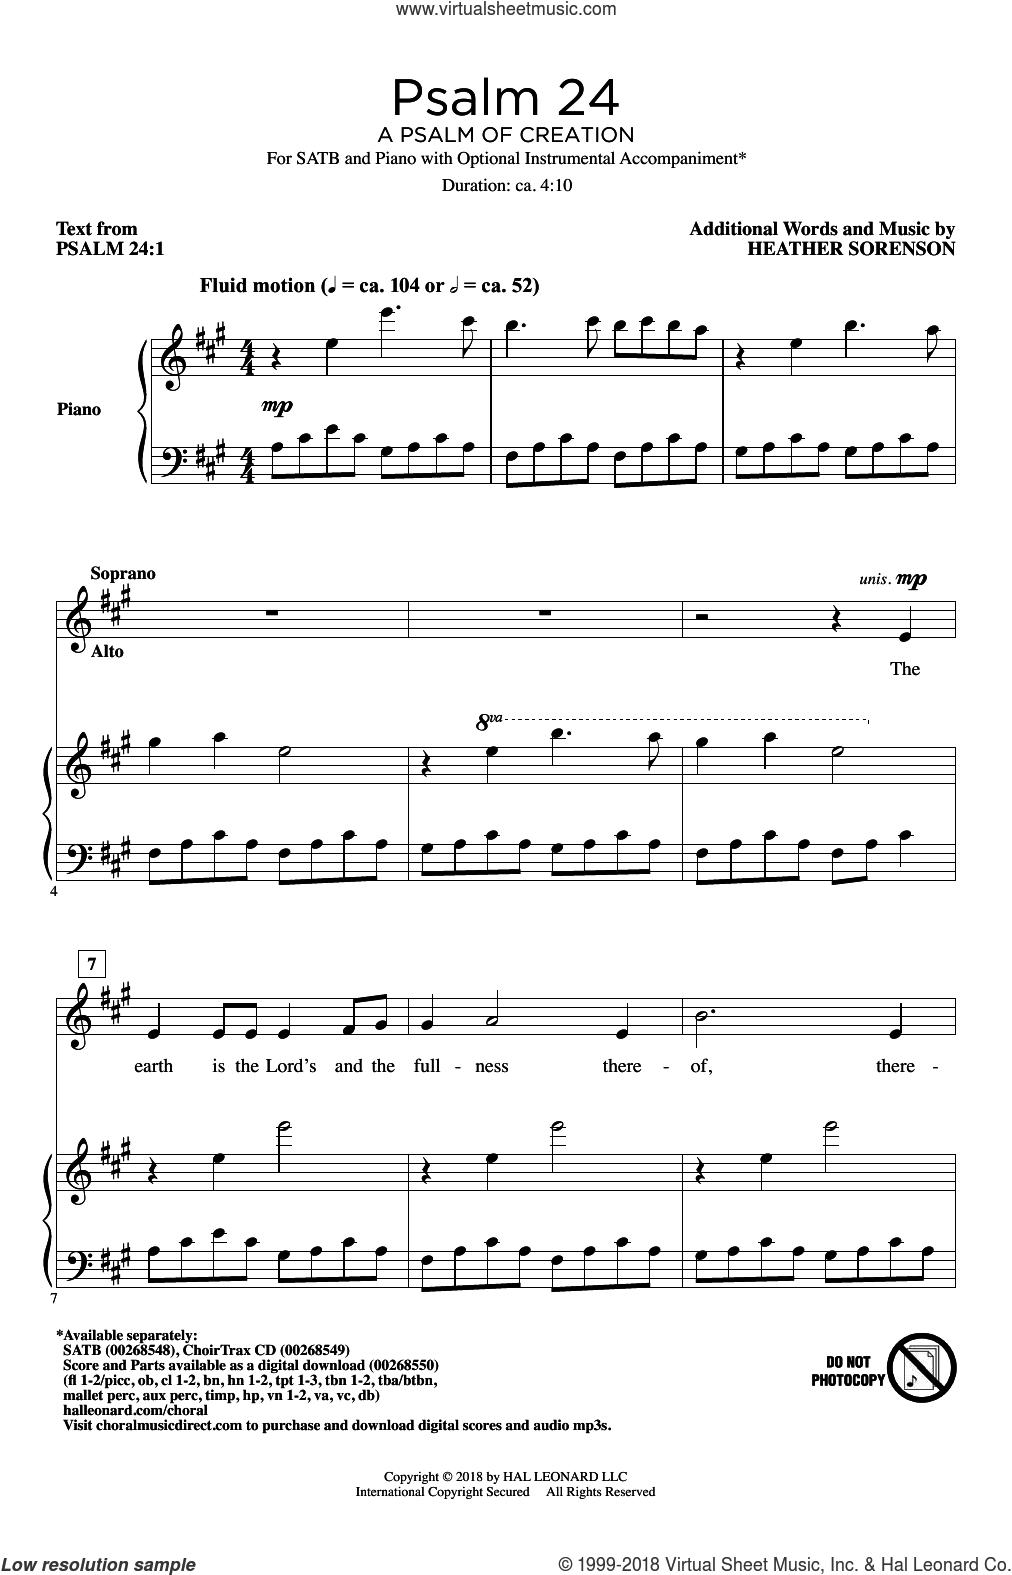 Psalm 24 (A Psalm Of Creation) sheet music for choir (SATB: soprano, alto, tenor, bass) by Heather Sorenson and Psalm 24:1, intermediate skill level